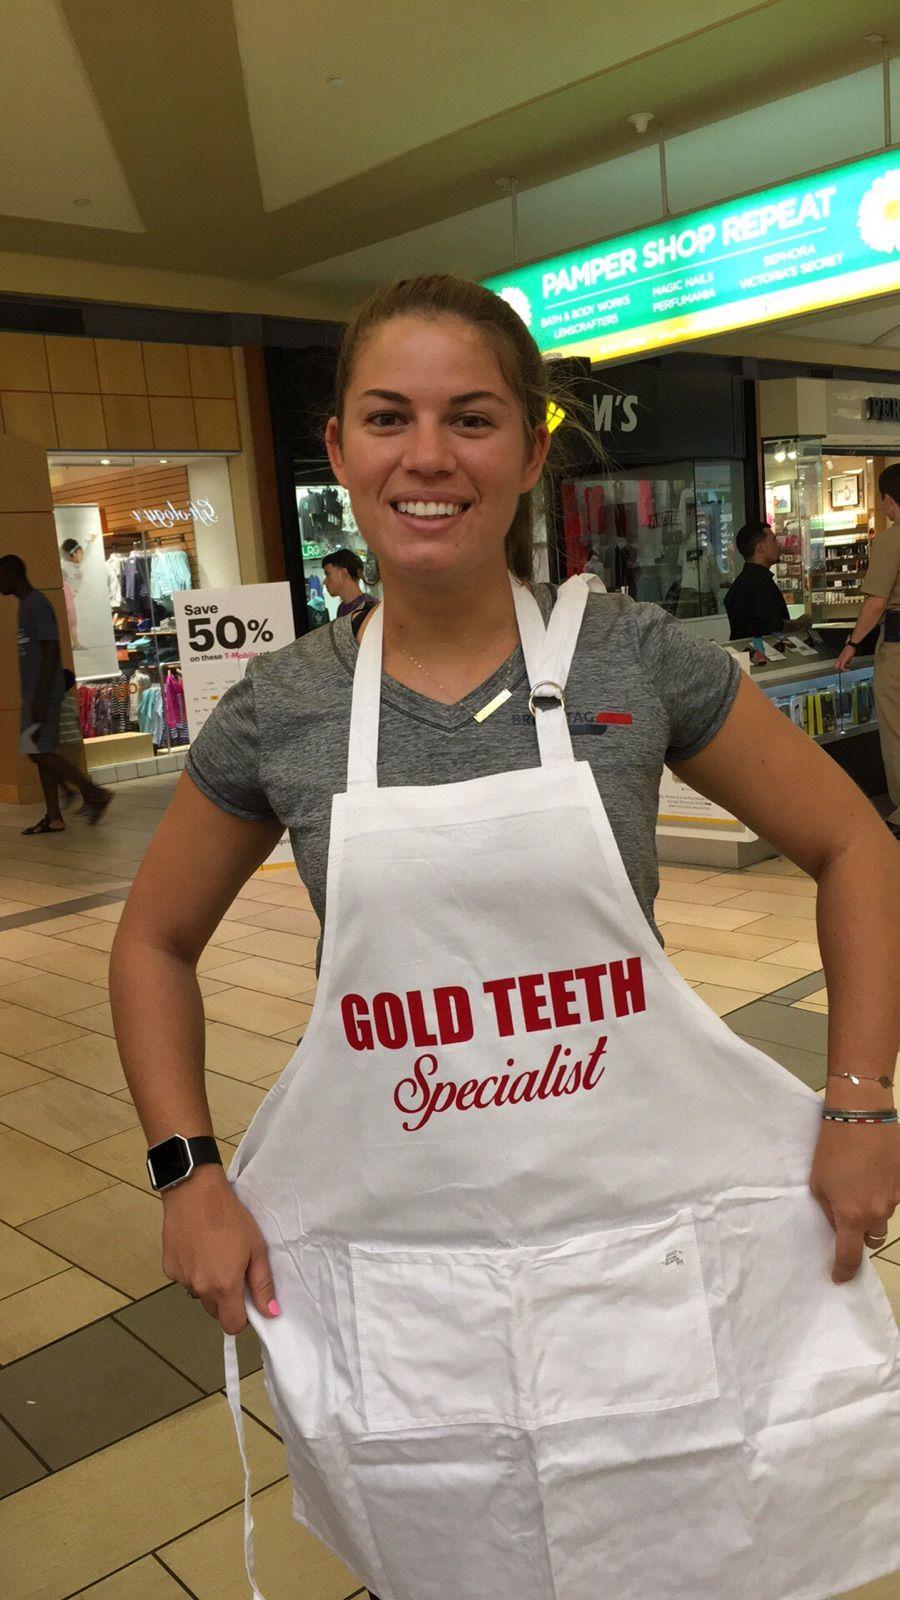 Custom Gold Teeth Grillz Gallery | GOLD TEETH SPECIALIST | Learn to